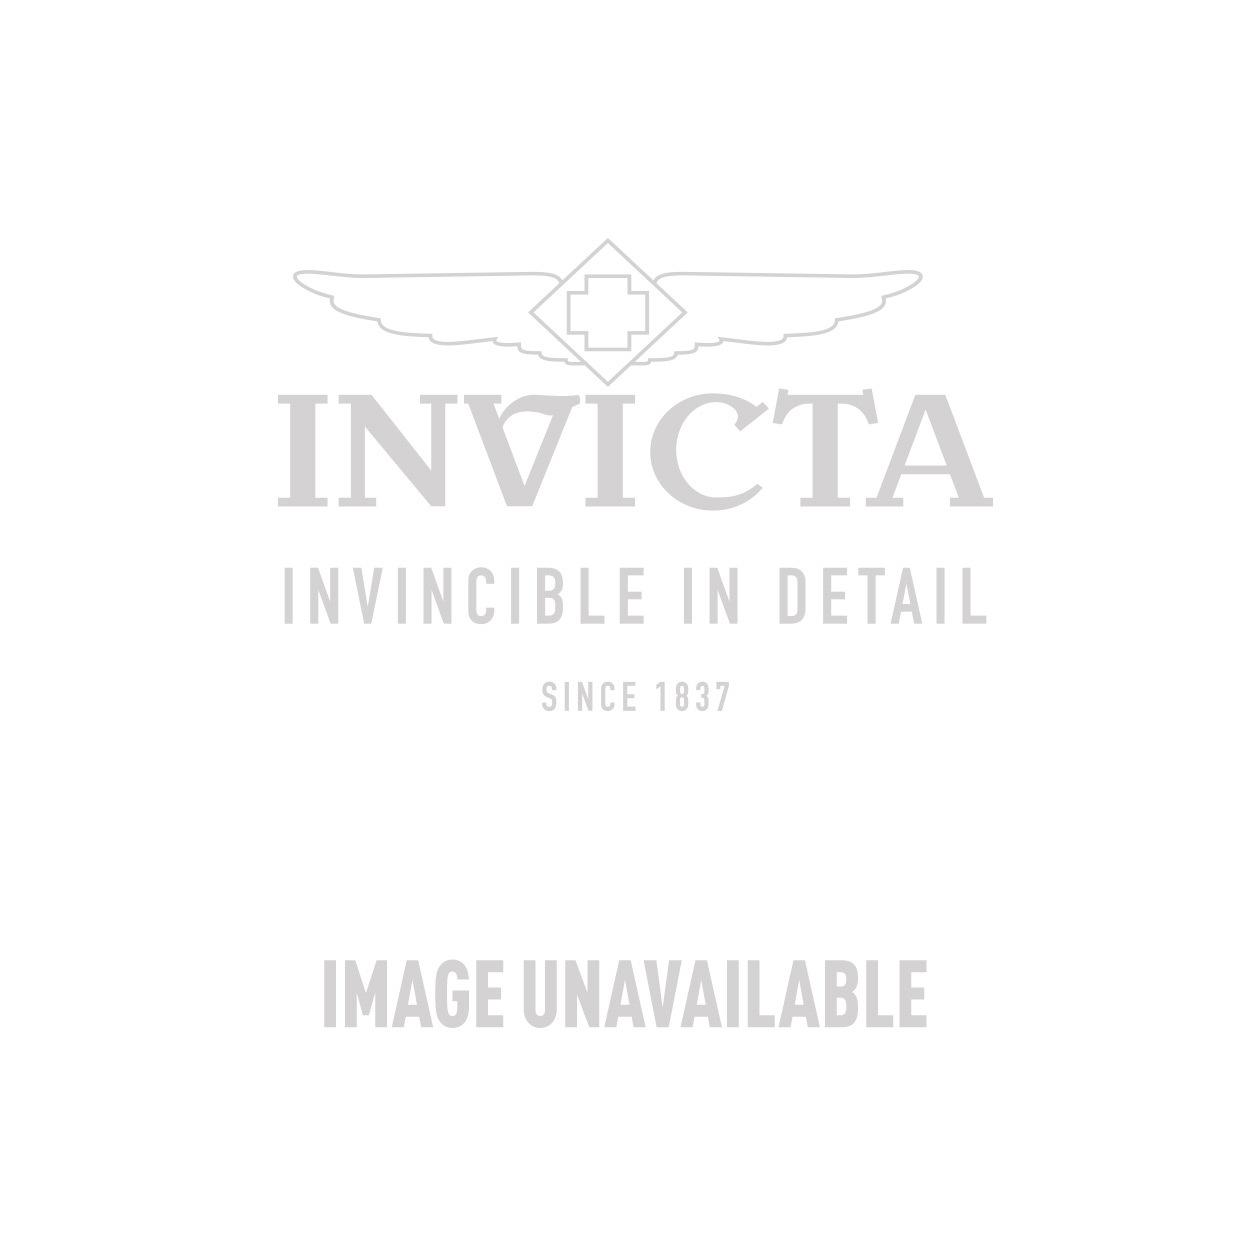 Invicta Lupah Swiss Movement Quartz Watch - Gunmetal case with Blue tone Leather band - Model 14939